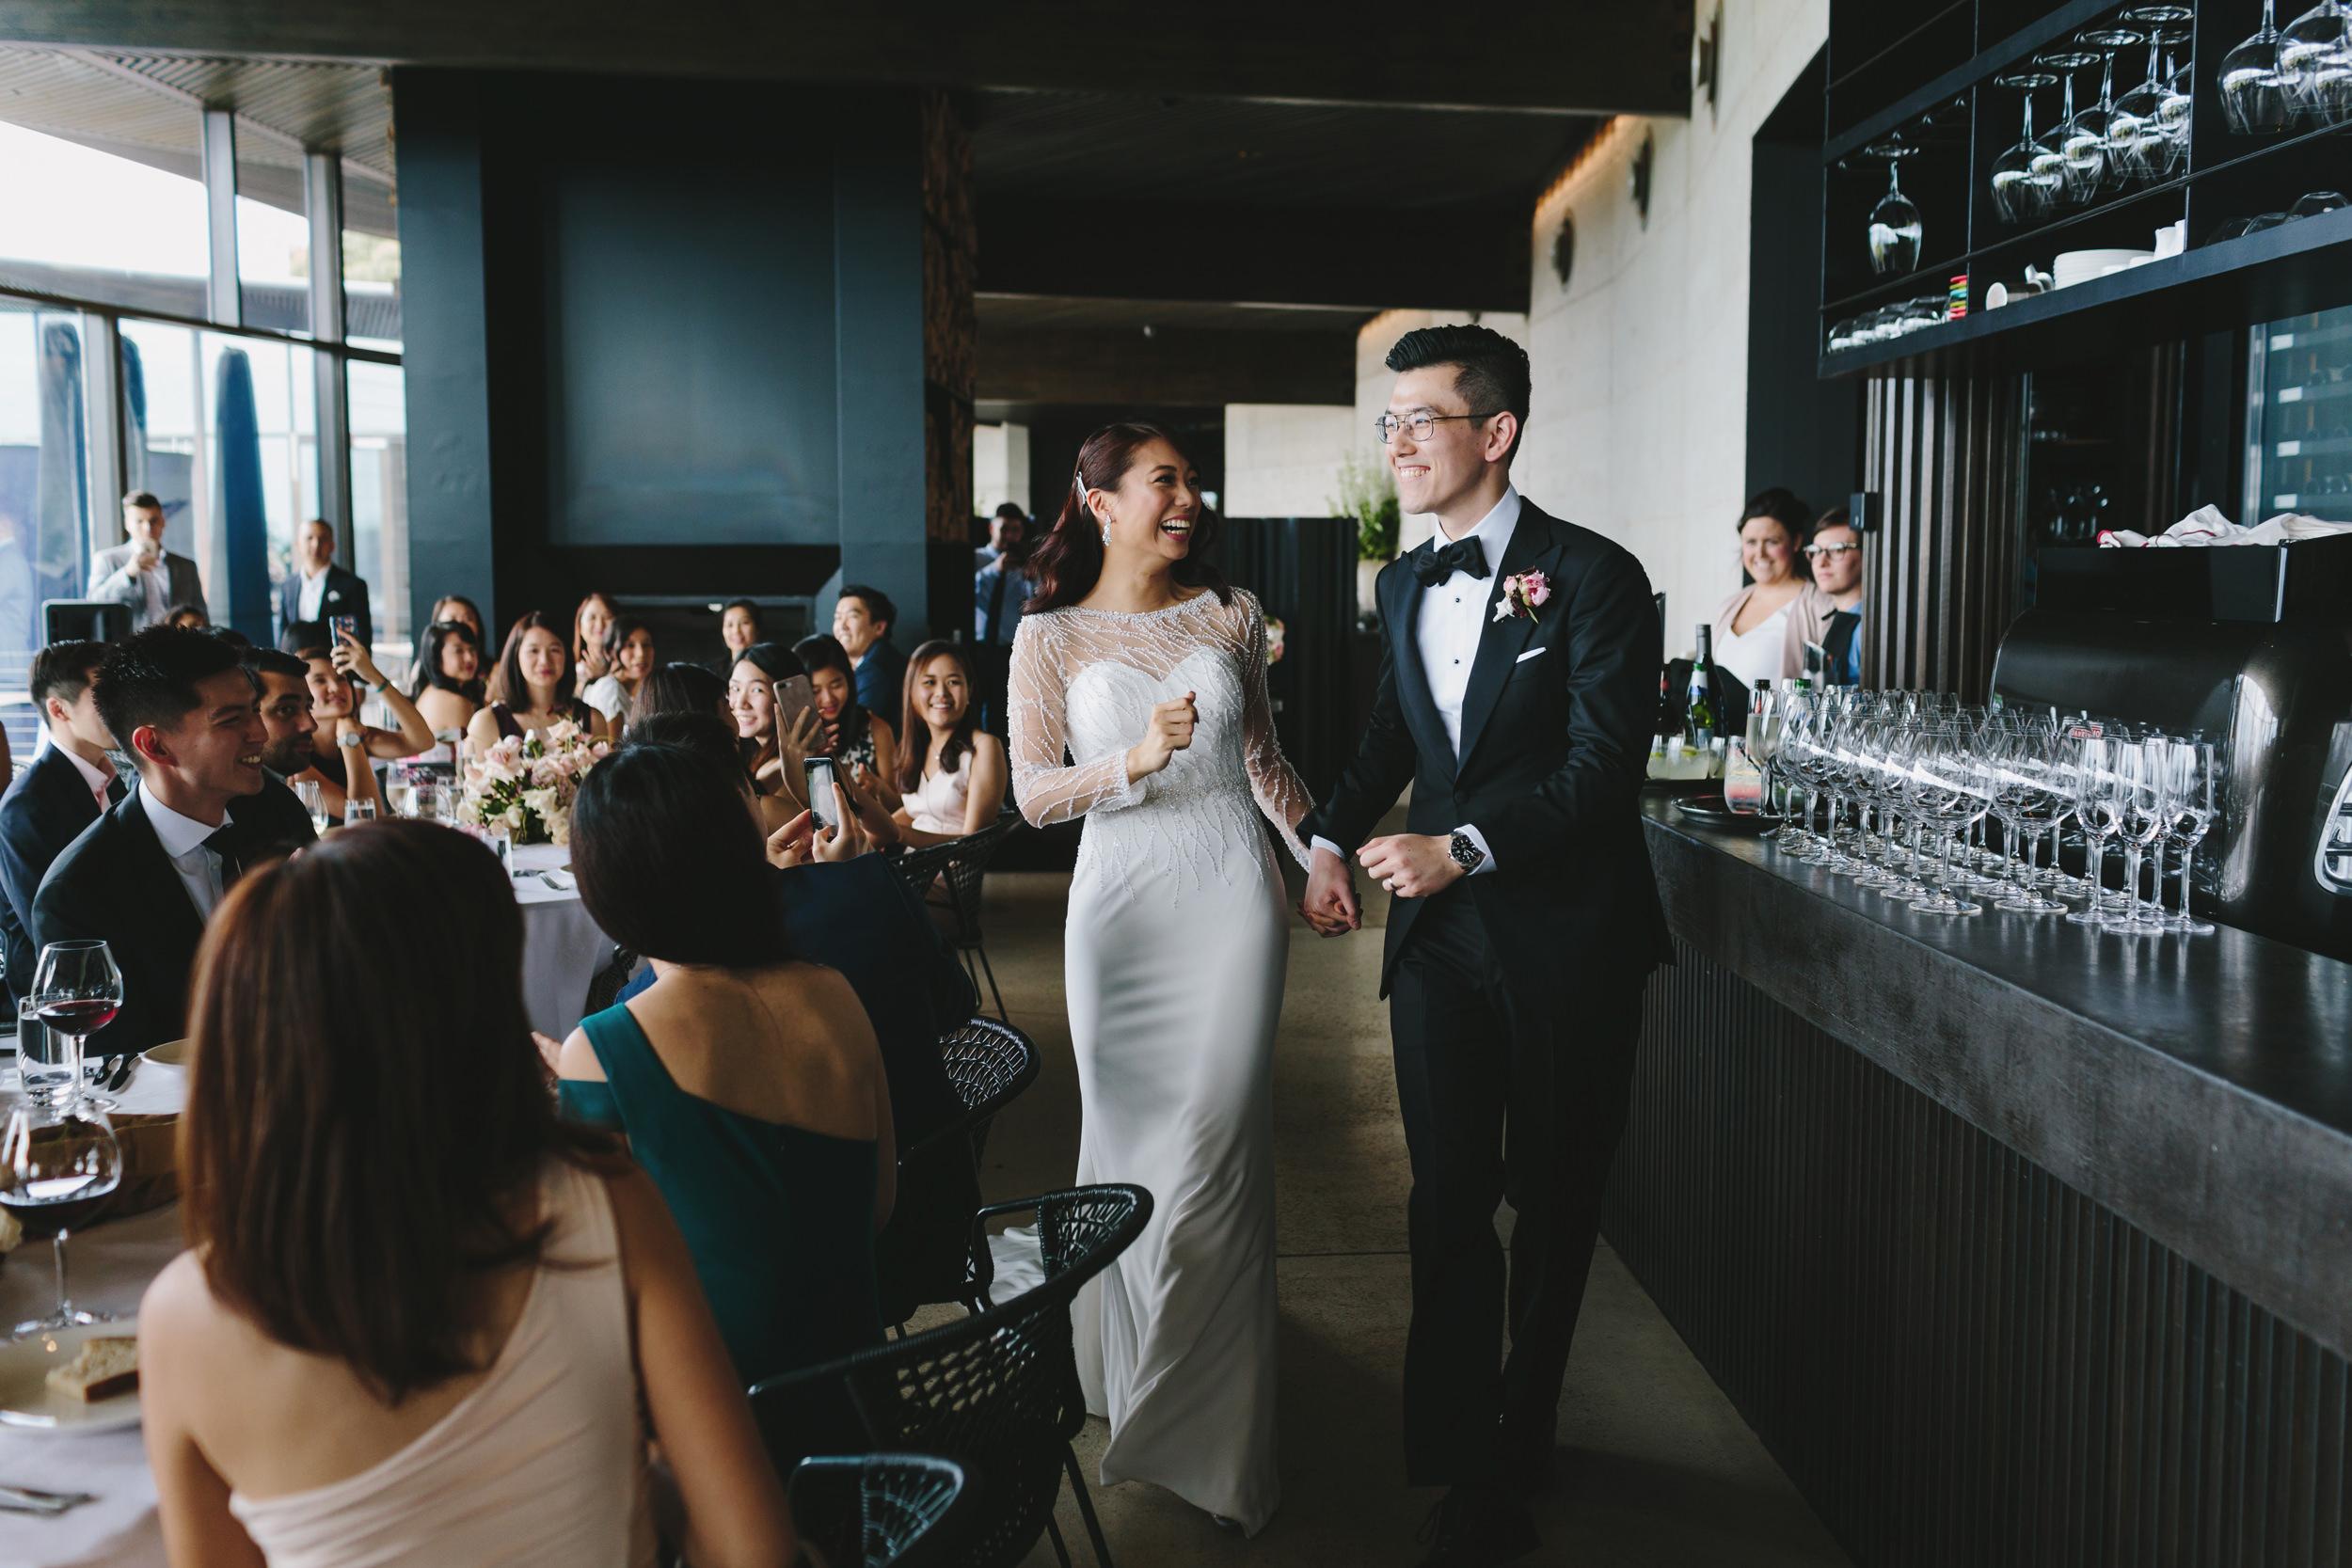 Melbourne Winery Wedding Daryl & Adeline 64.JPG